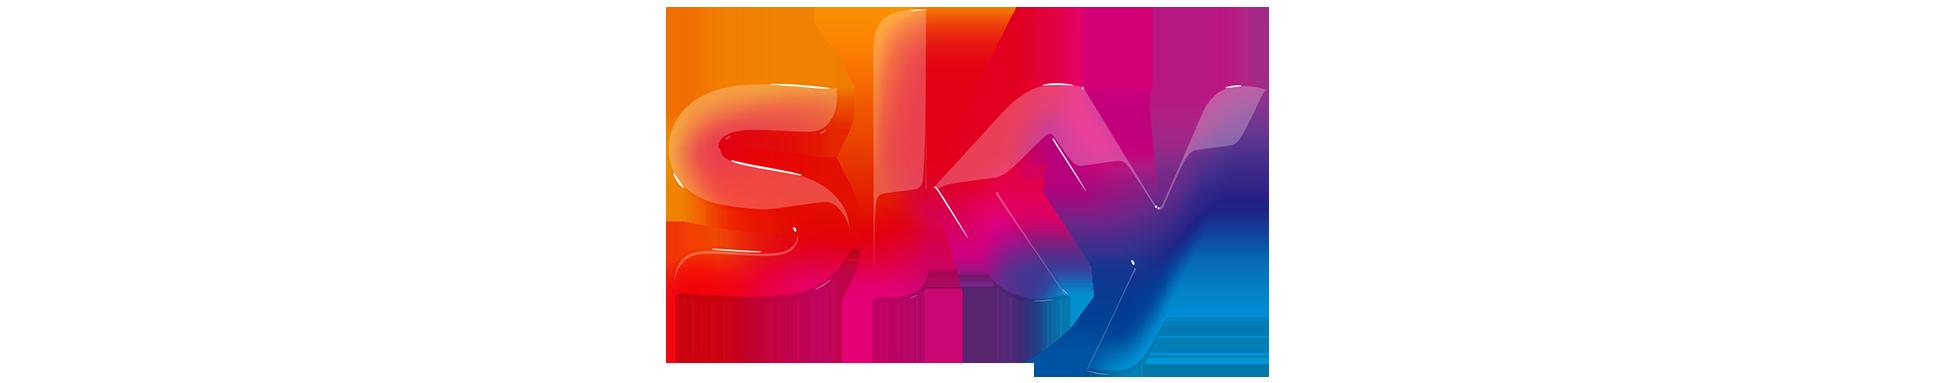 sky-color